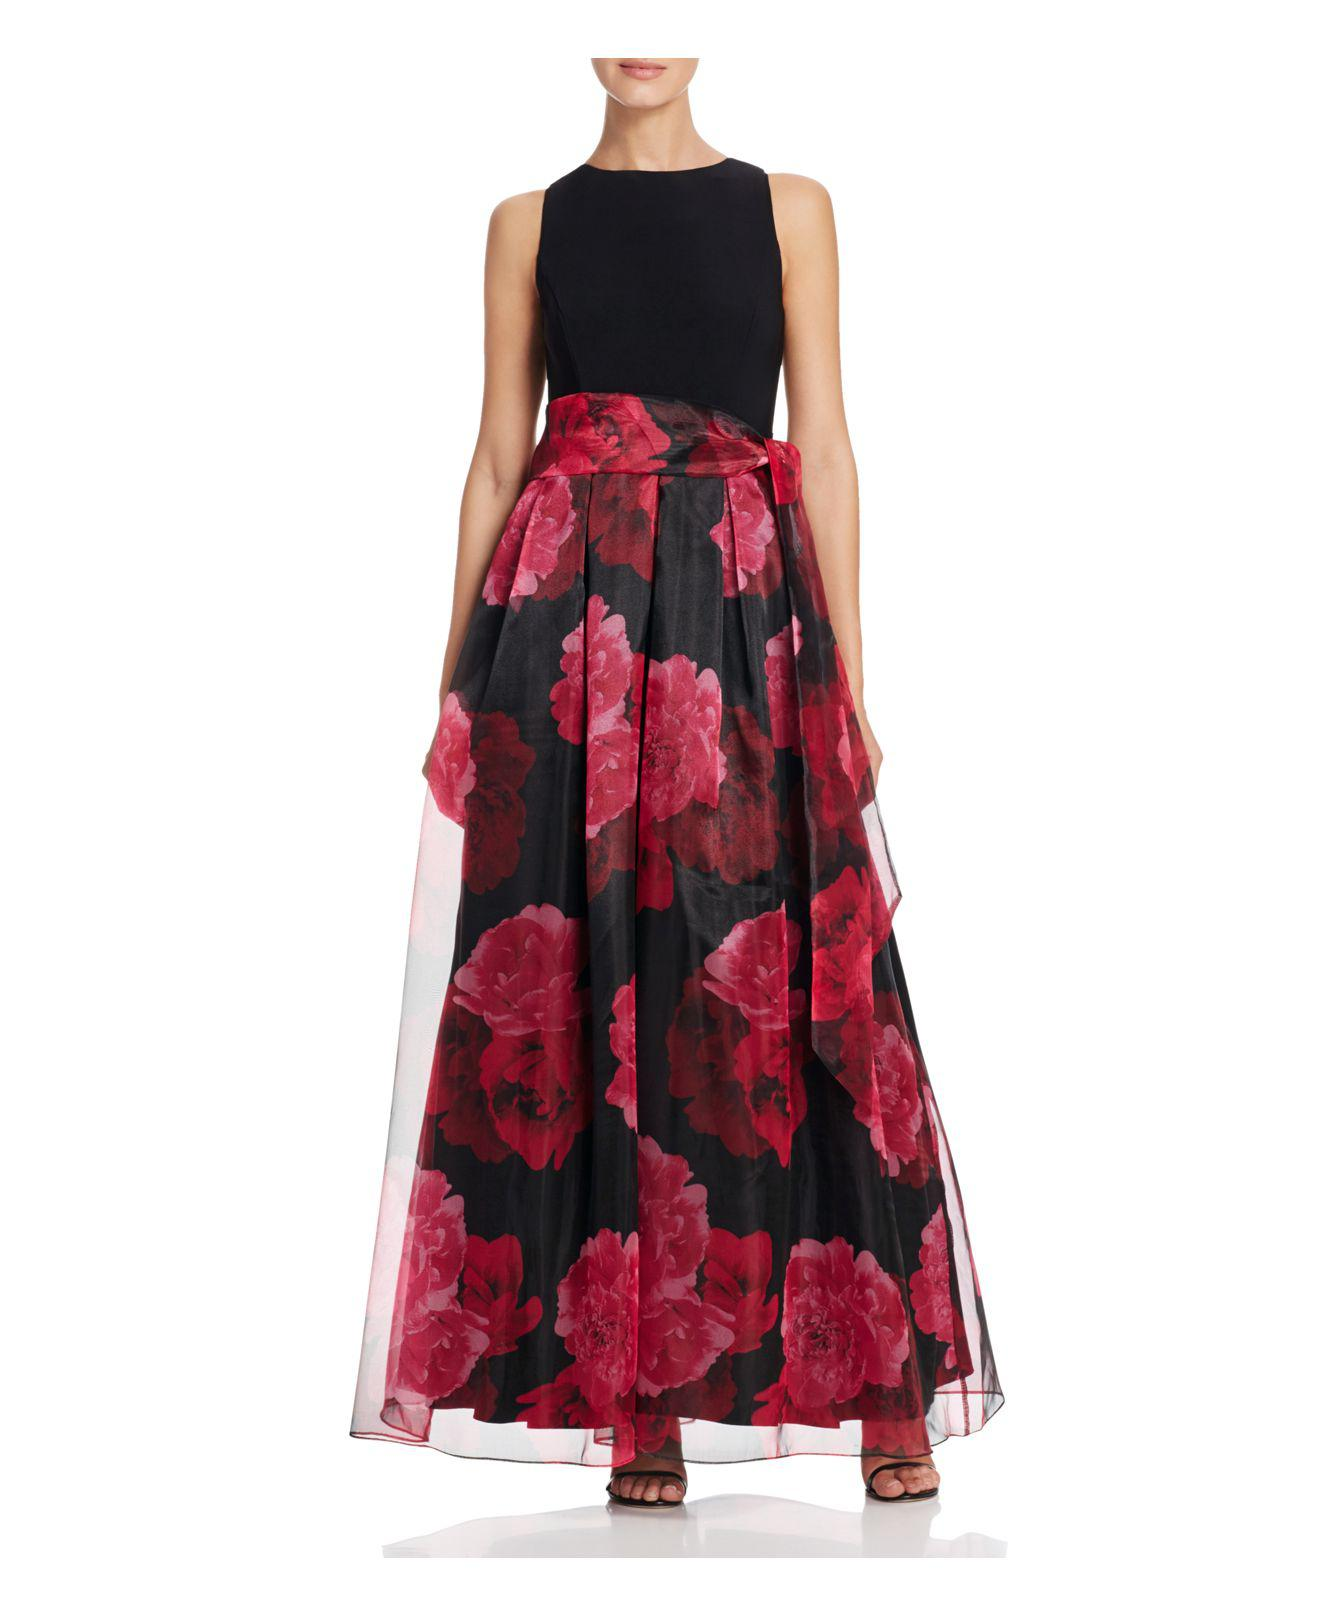 Lyst - Eliza J Jewel Neck Sleeveless Floral Print Organza Ball Gown ...